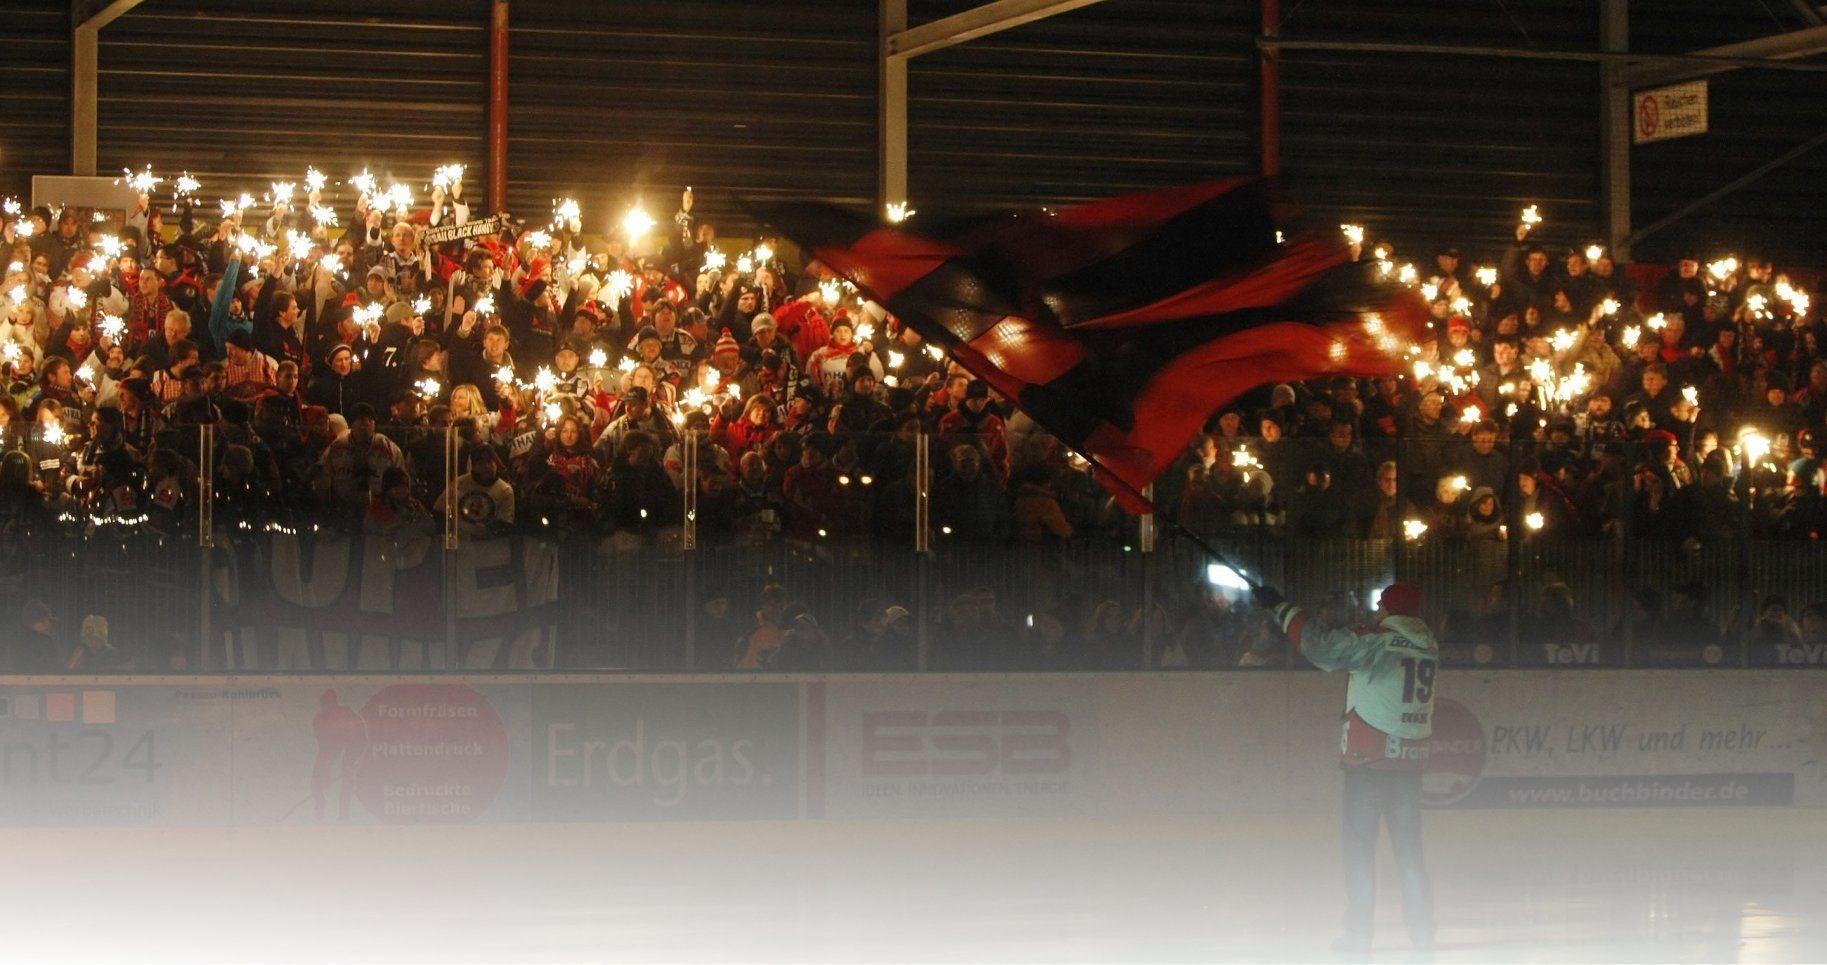 Über uns | 1. Eishockey Fanclub Passau e. V.